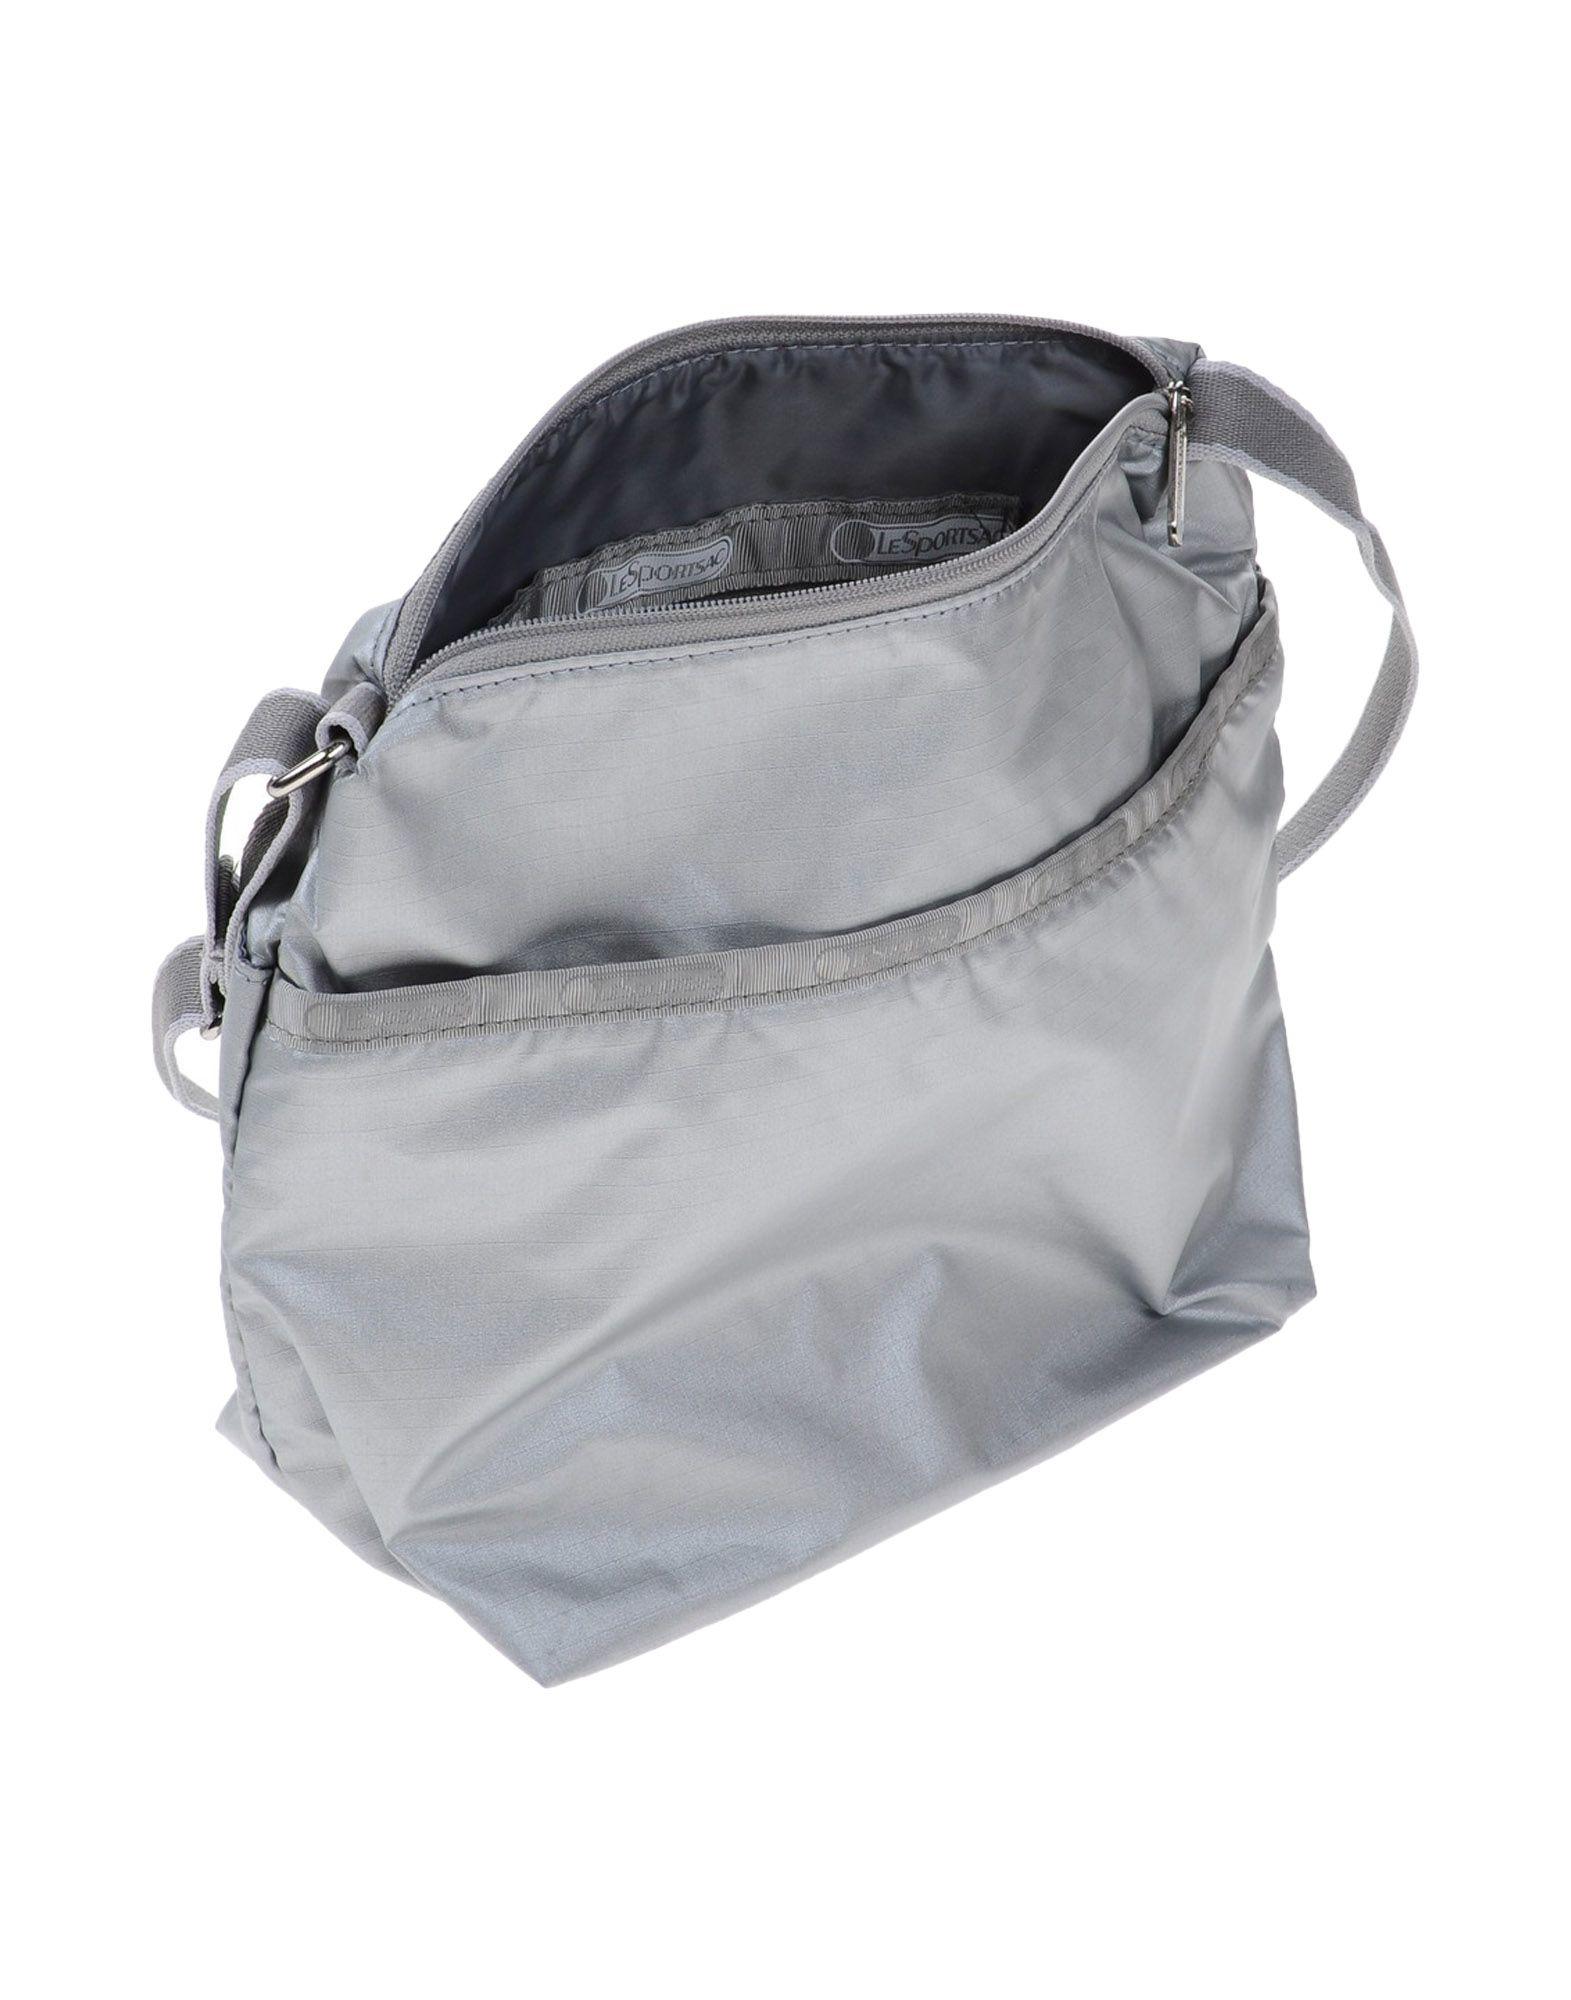 LeSportsac Synthetic Cross-body Bag in Grey (Grey)